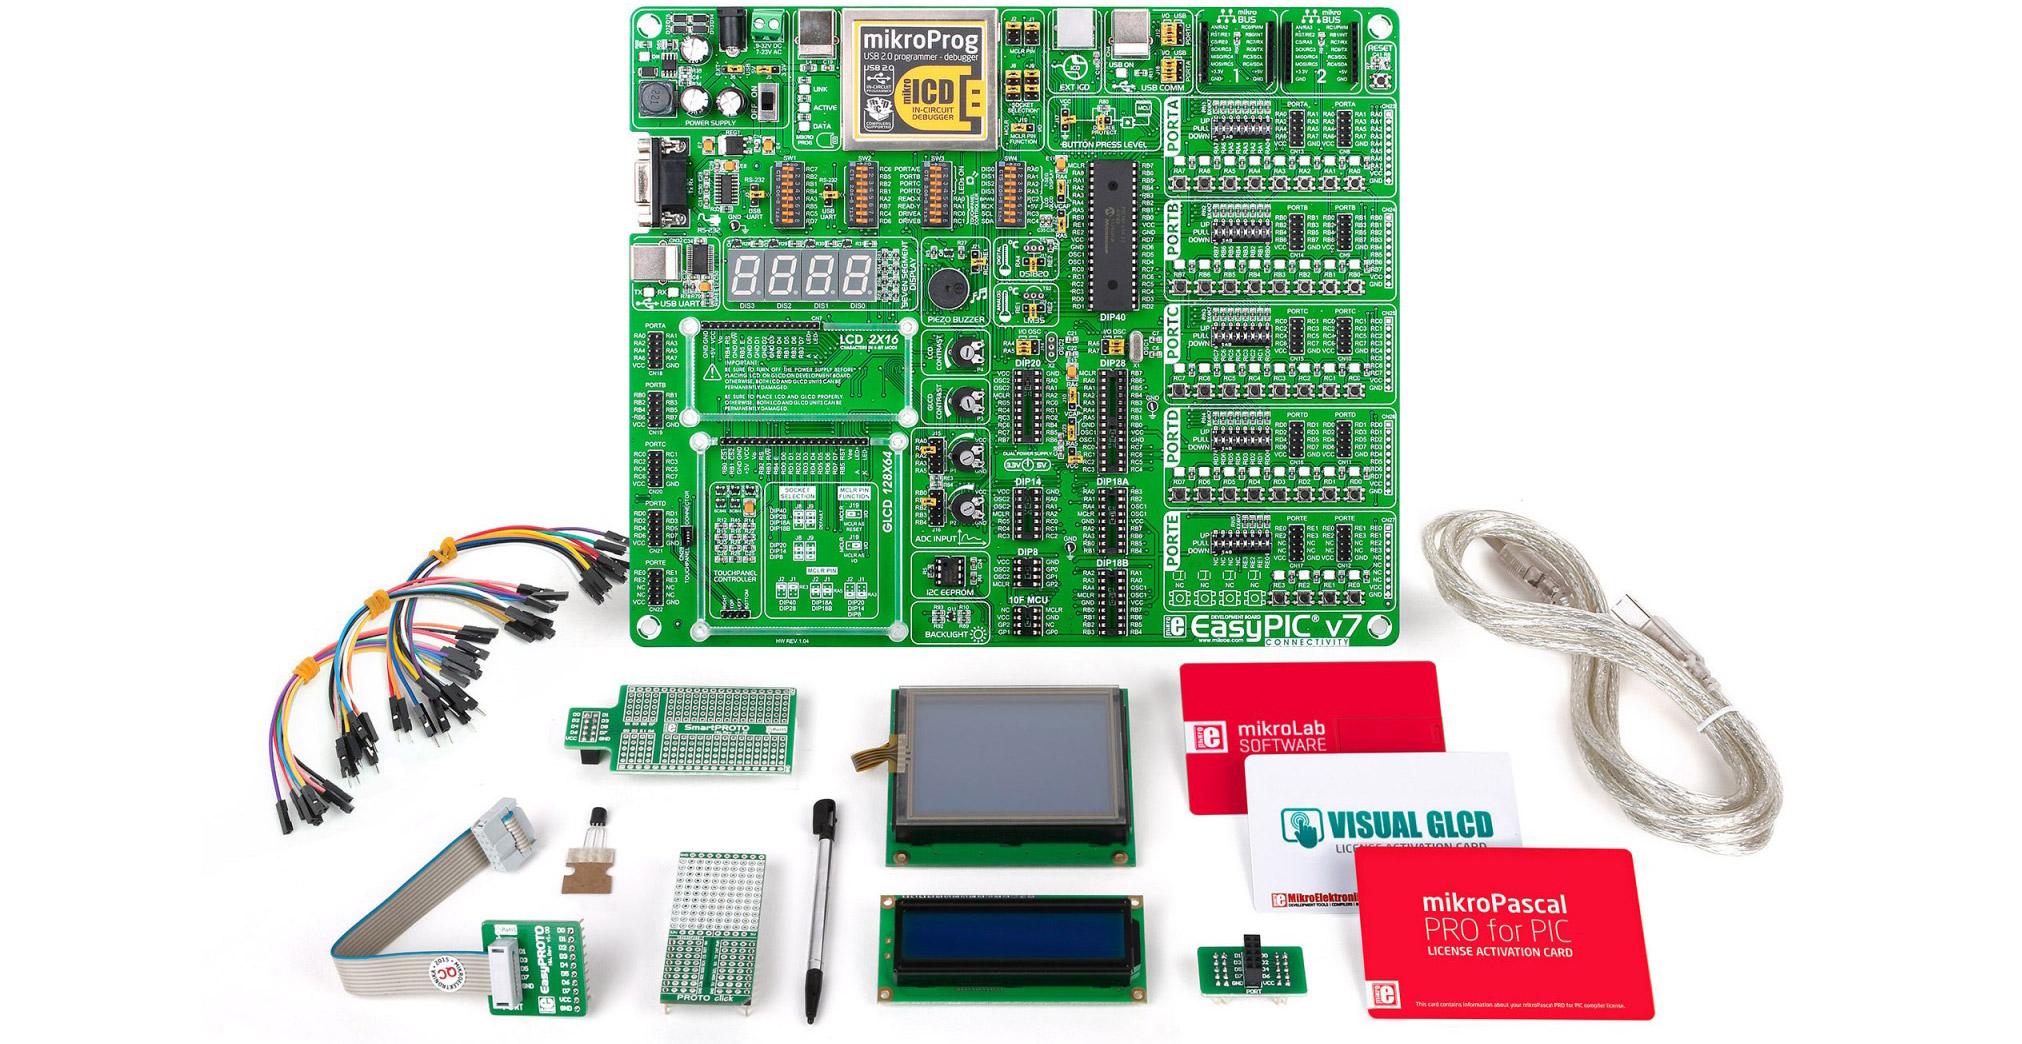 mikroPascal mikroLab kit